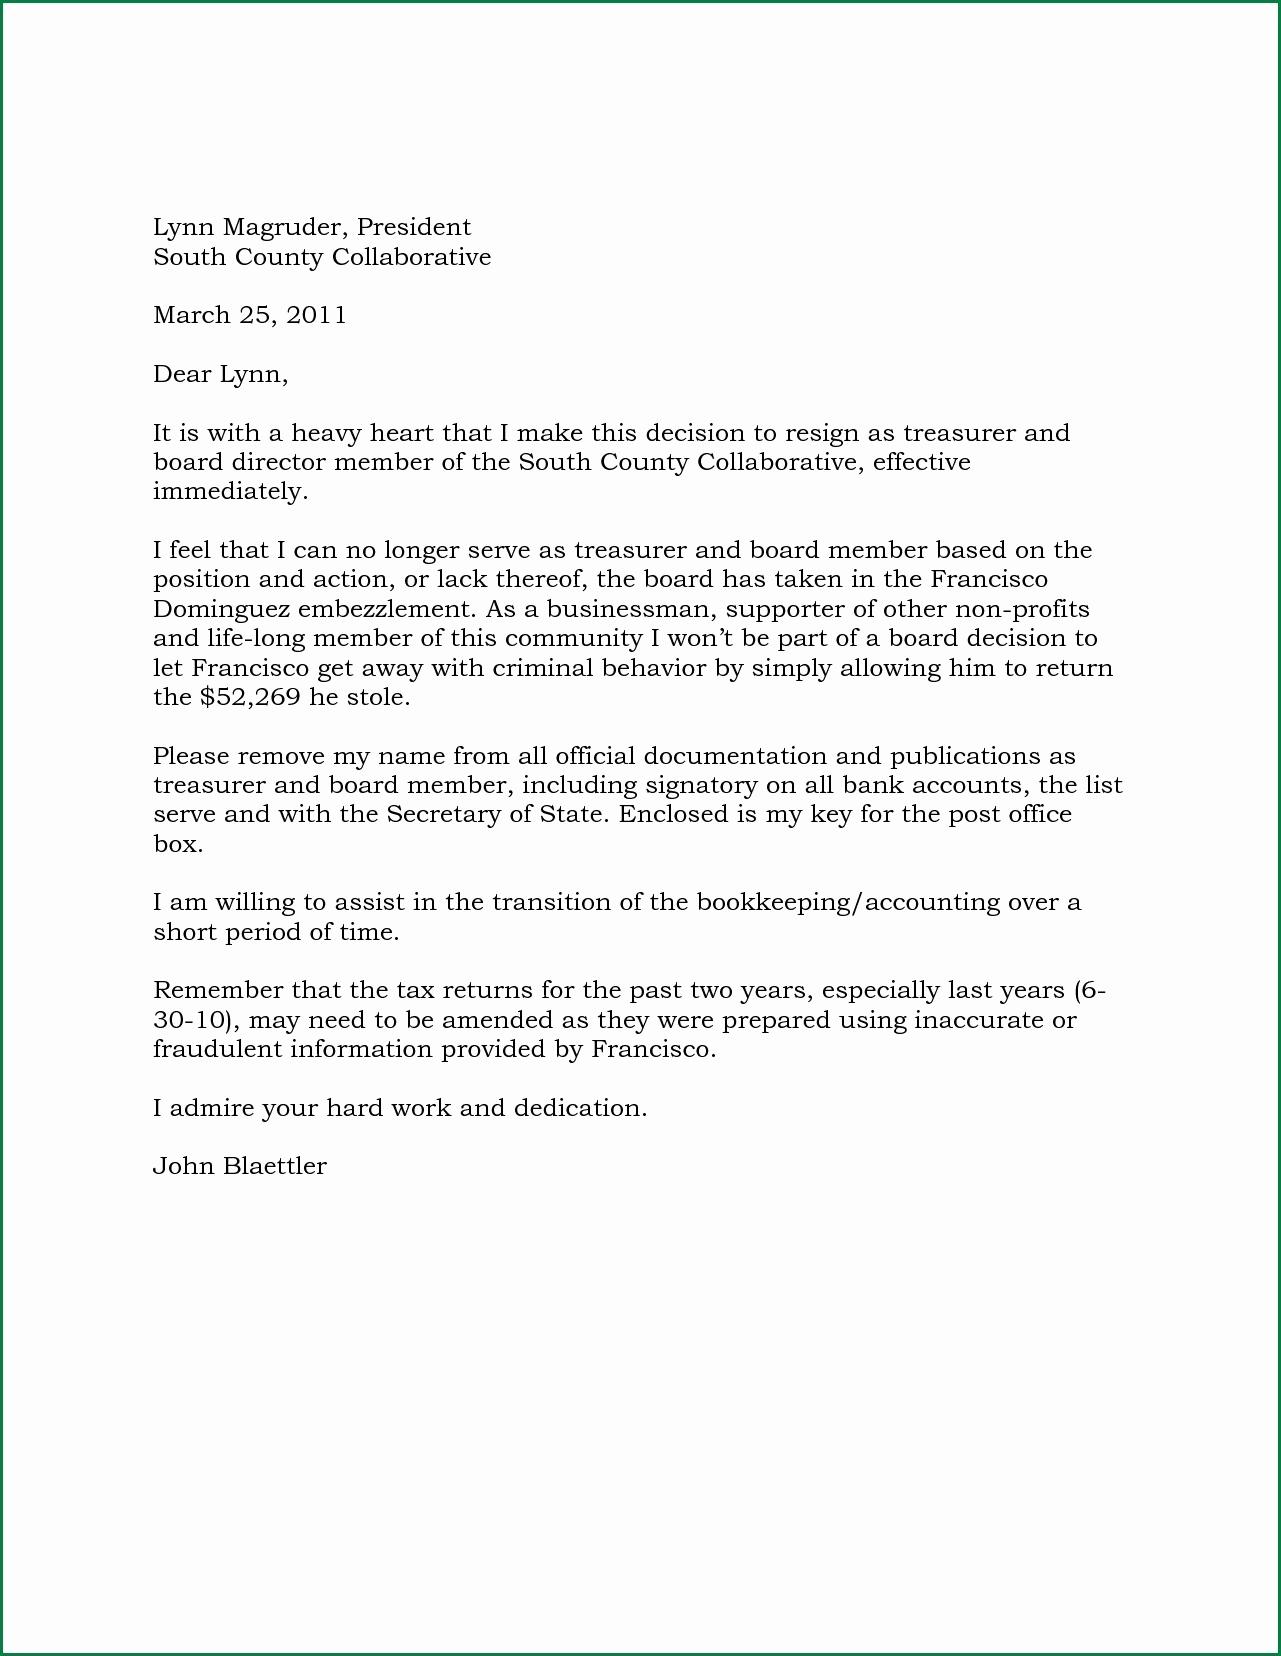 Board Member Resignation Letter Template - Resignation Letter Non Profit organization Beautiful Director